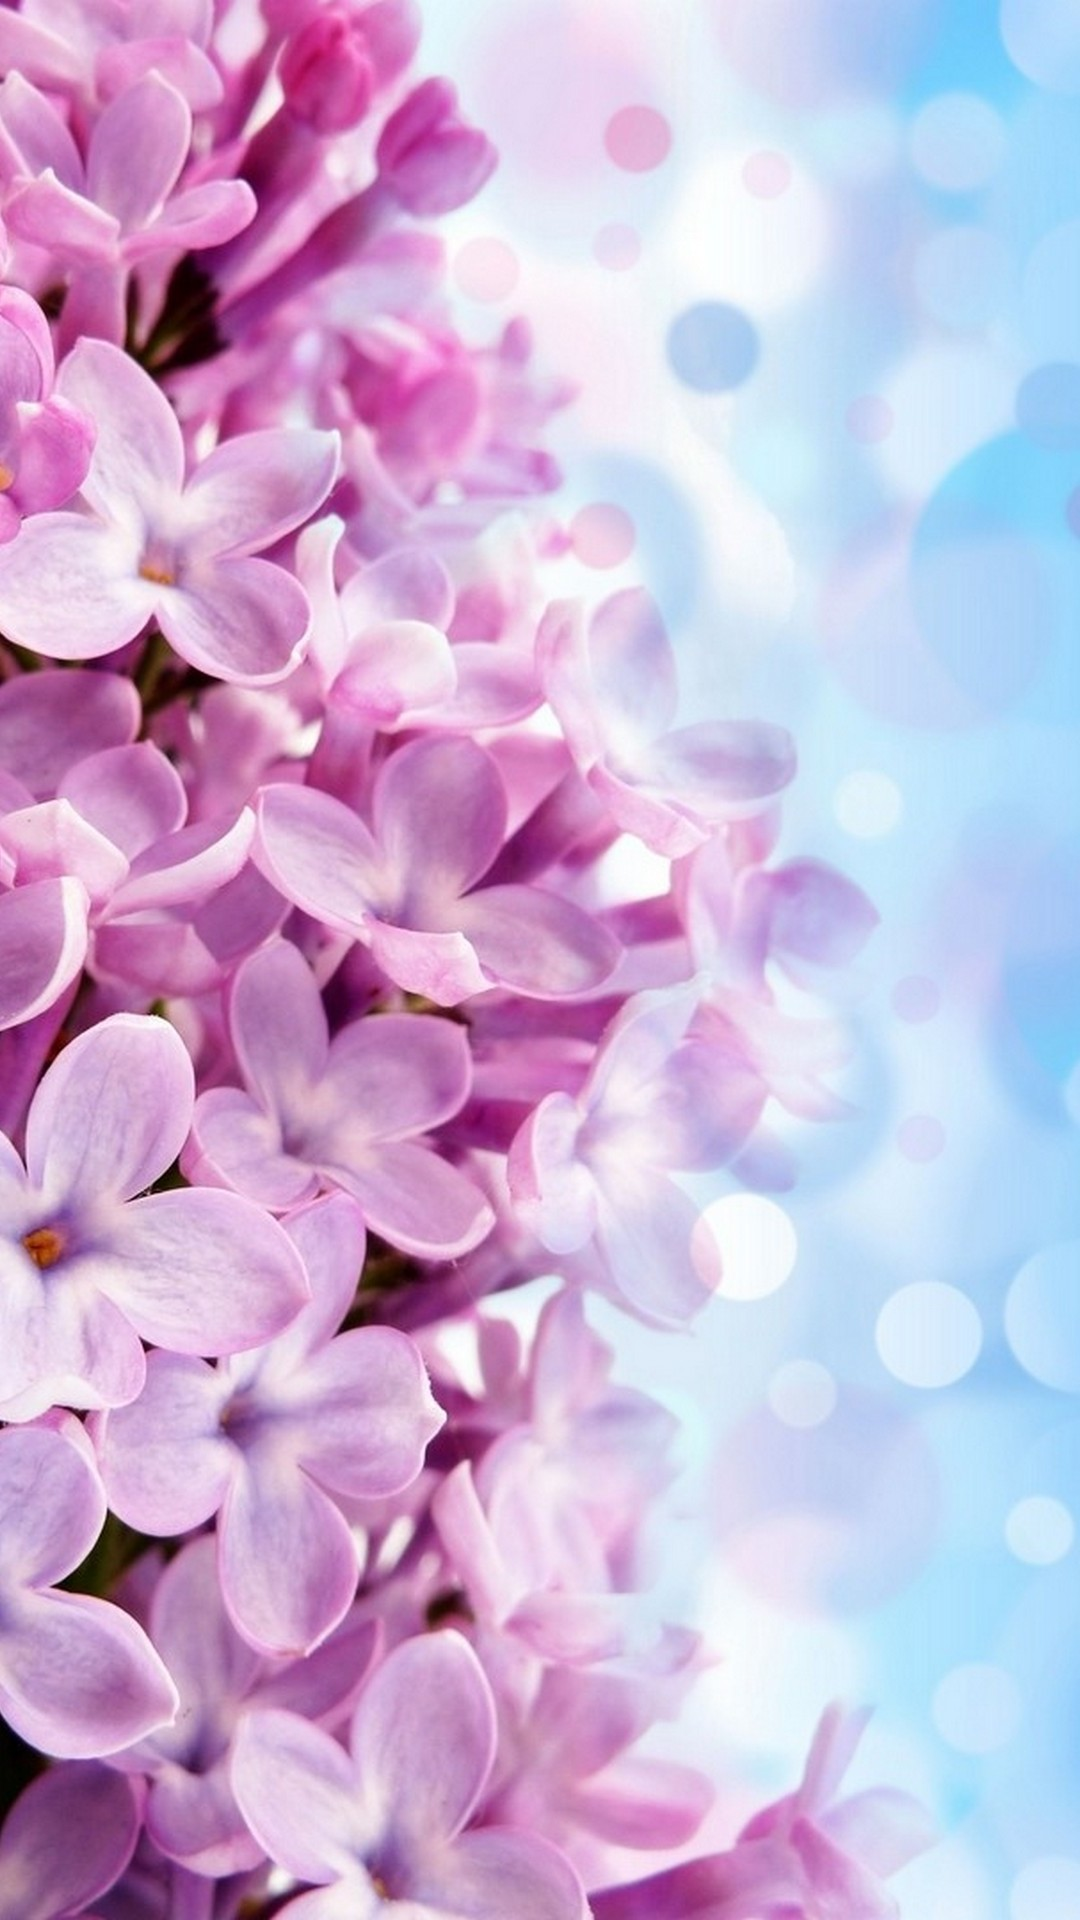 Iphone Wallpaper Hd Purple Flowers 2020 Cute Wallpapers